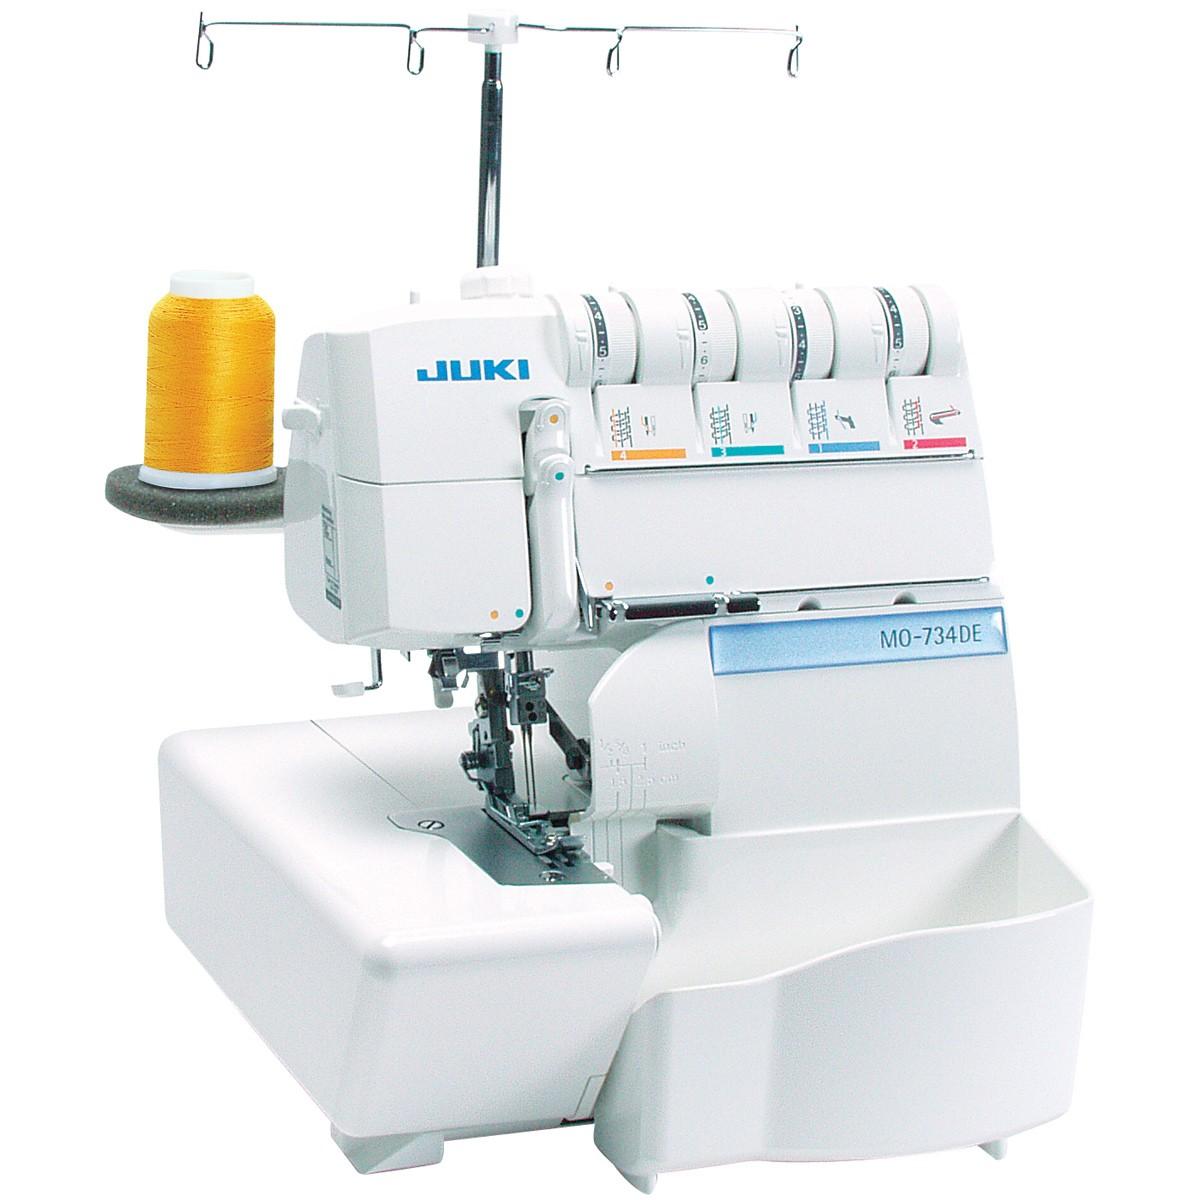 mo 734de products rh jukihome com Overlock Sewing Machine eBay Lock Sewing Machines Overlock Industrial Designer